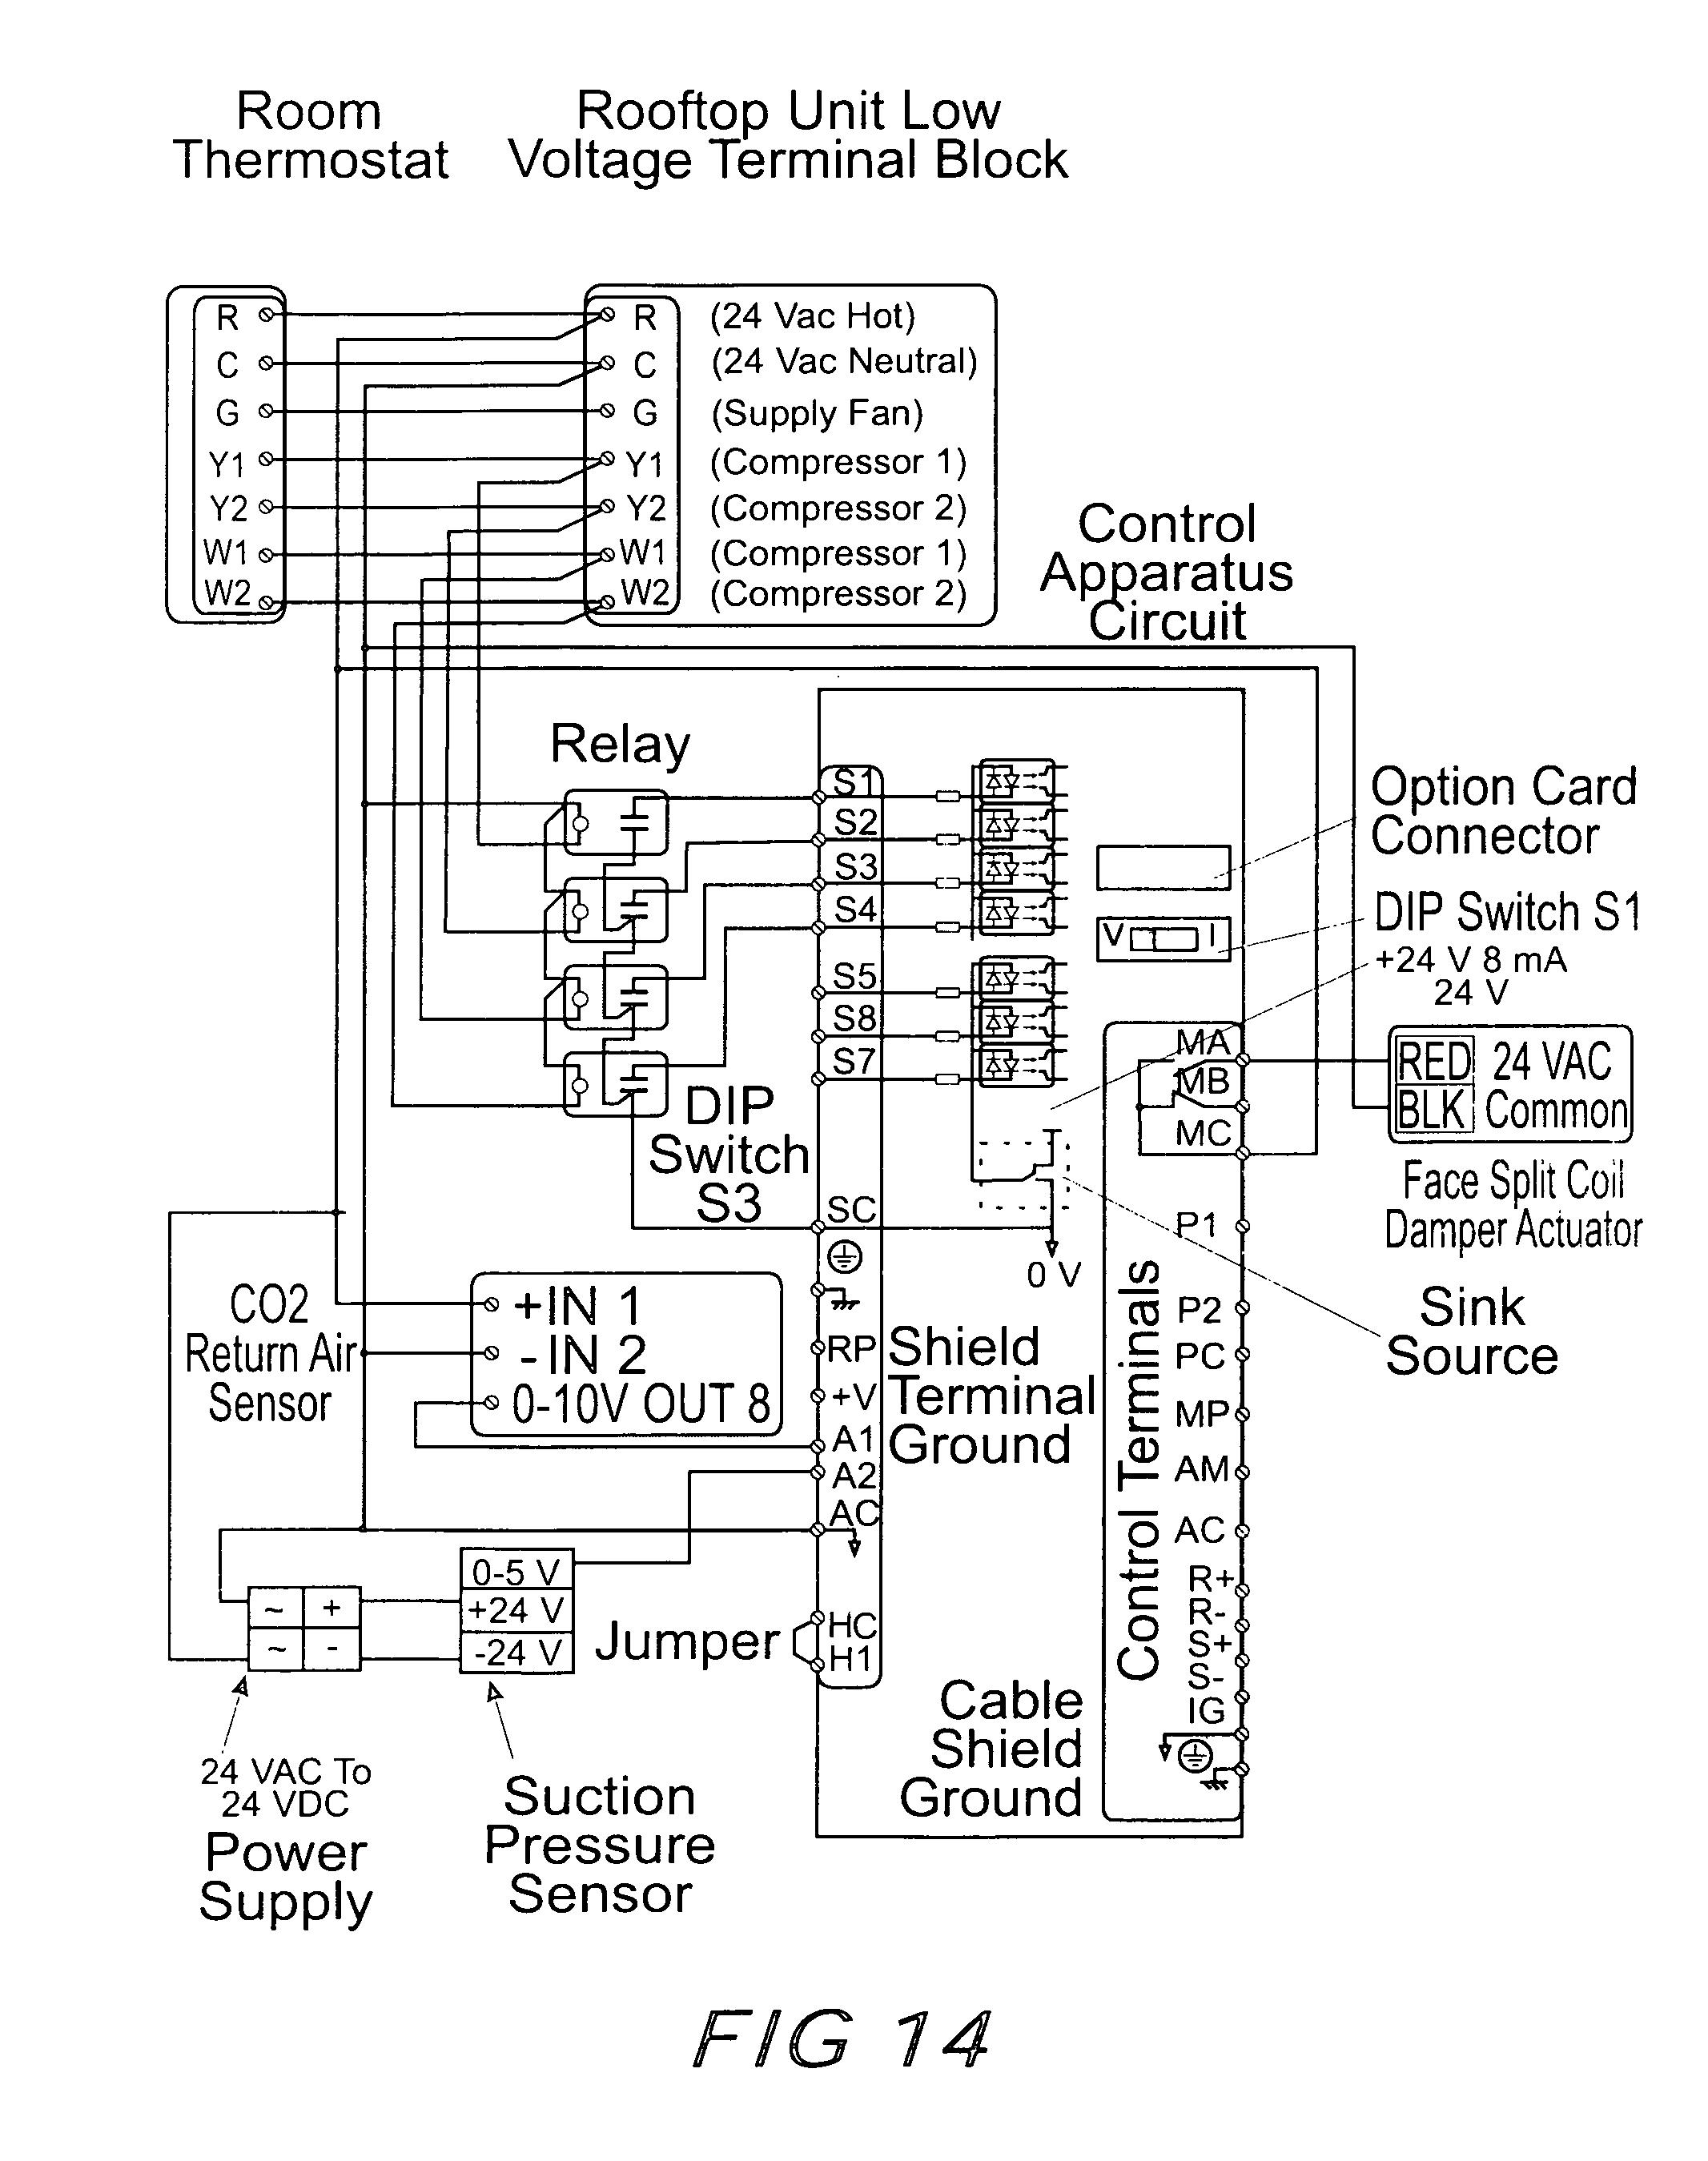 Wonderful Motor Starter Wiring Diagram Gallery Schematic symbol – Dip Switch Wiring Diagram